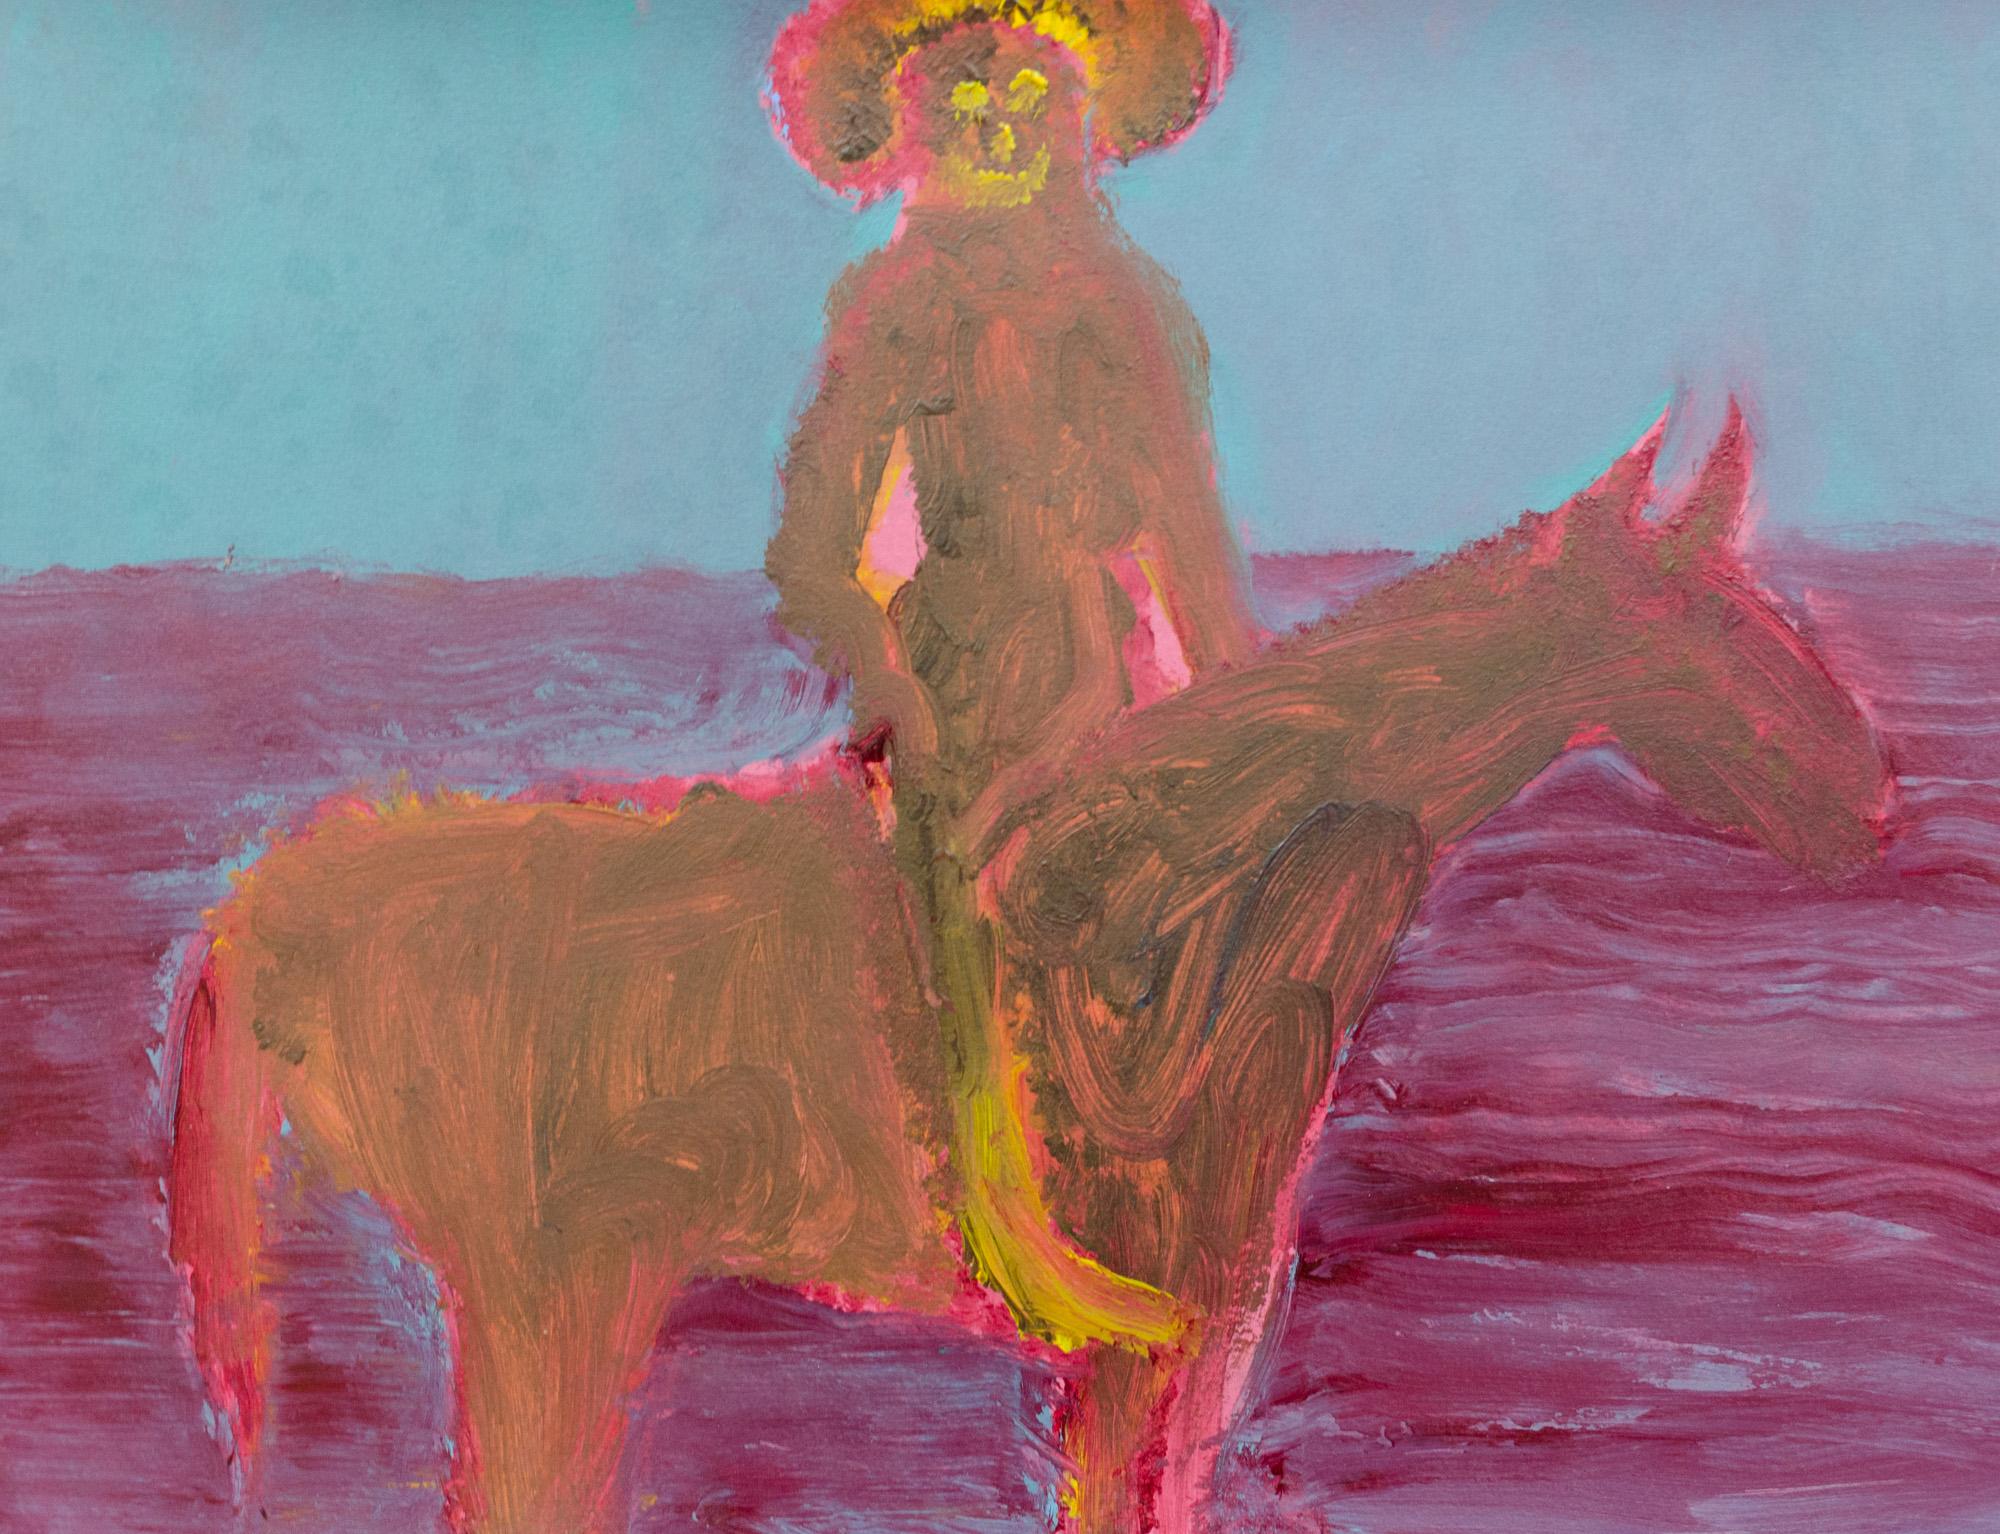 Rhys Lee, Riders, 2016, Acrylic on paper, 28 x 38cm, $700-30.jpg